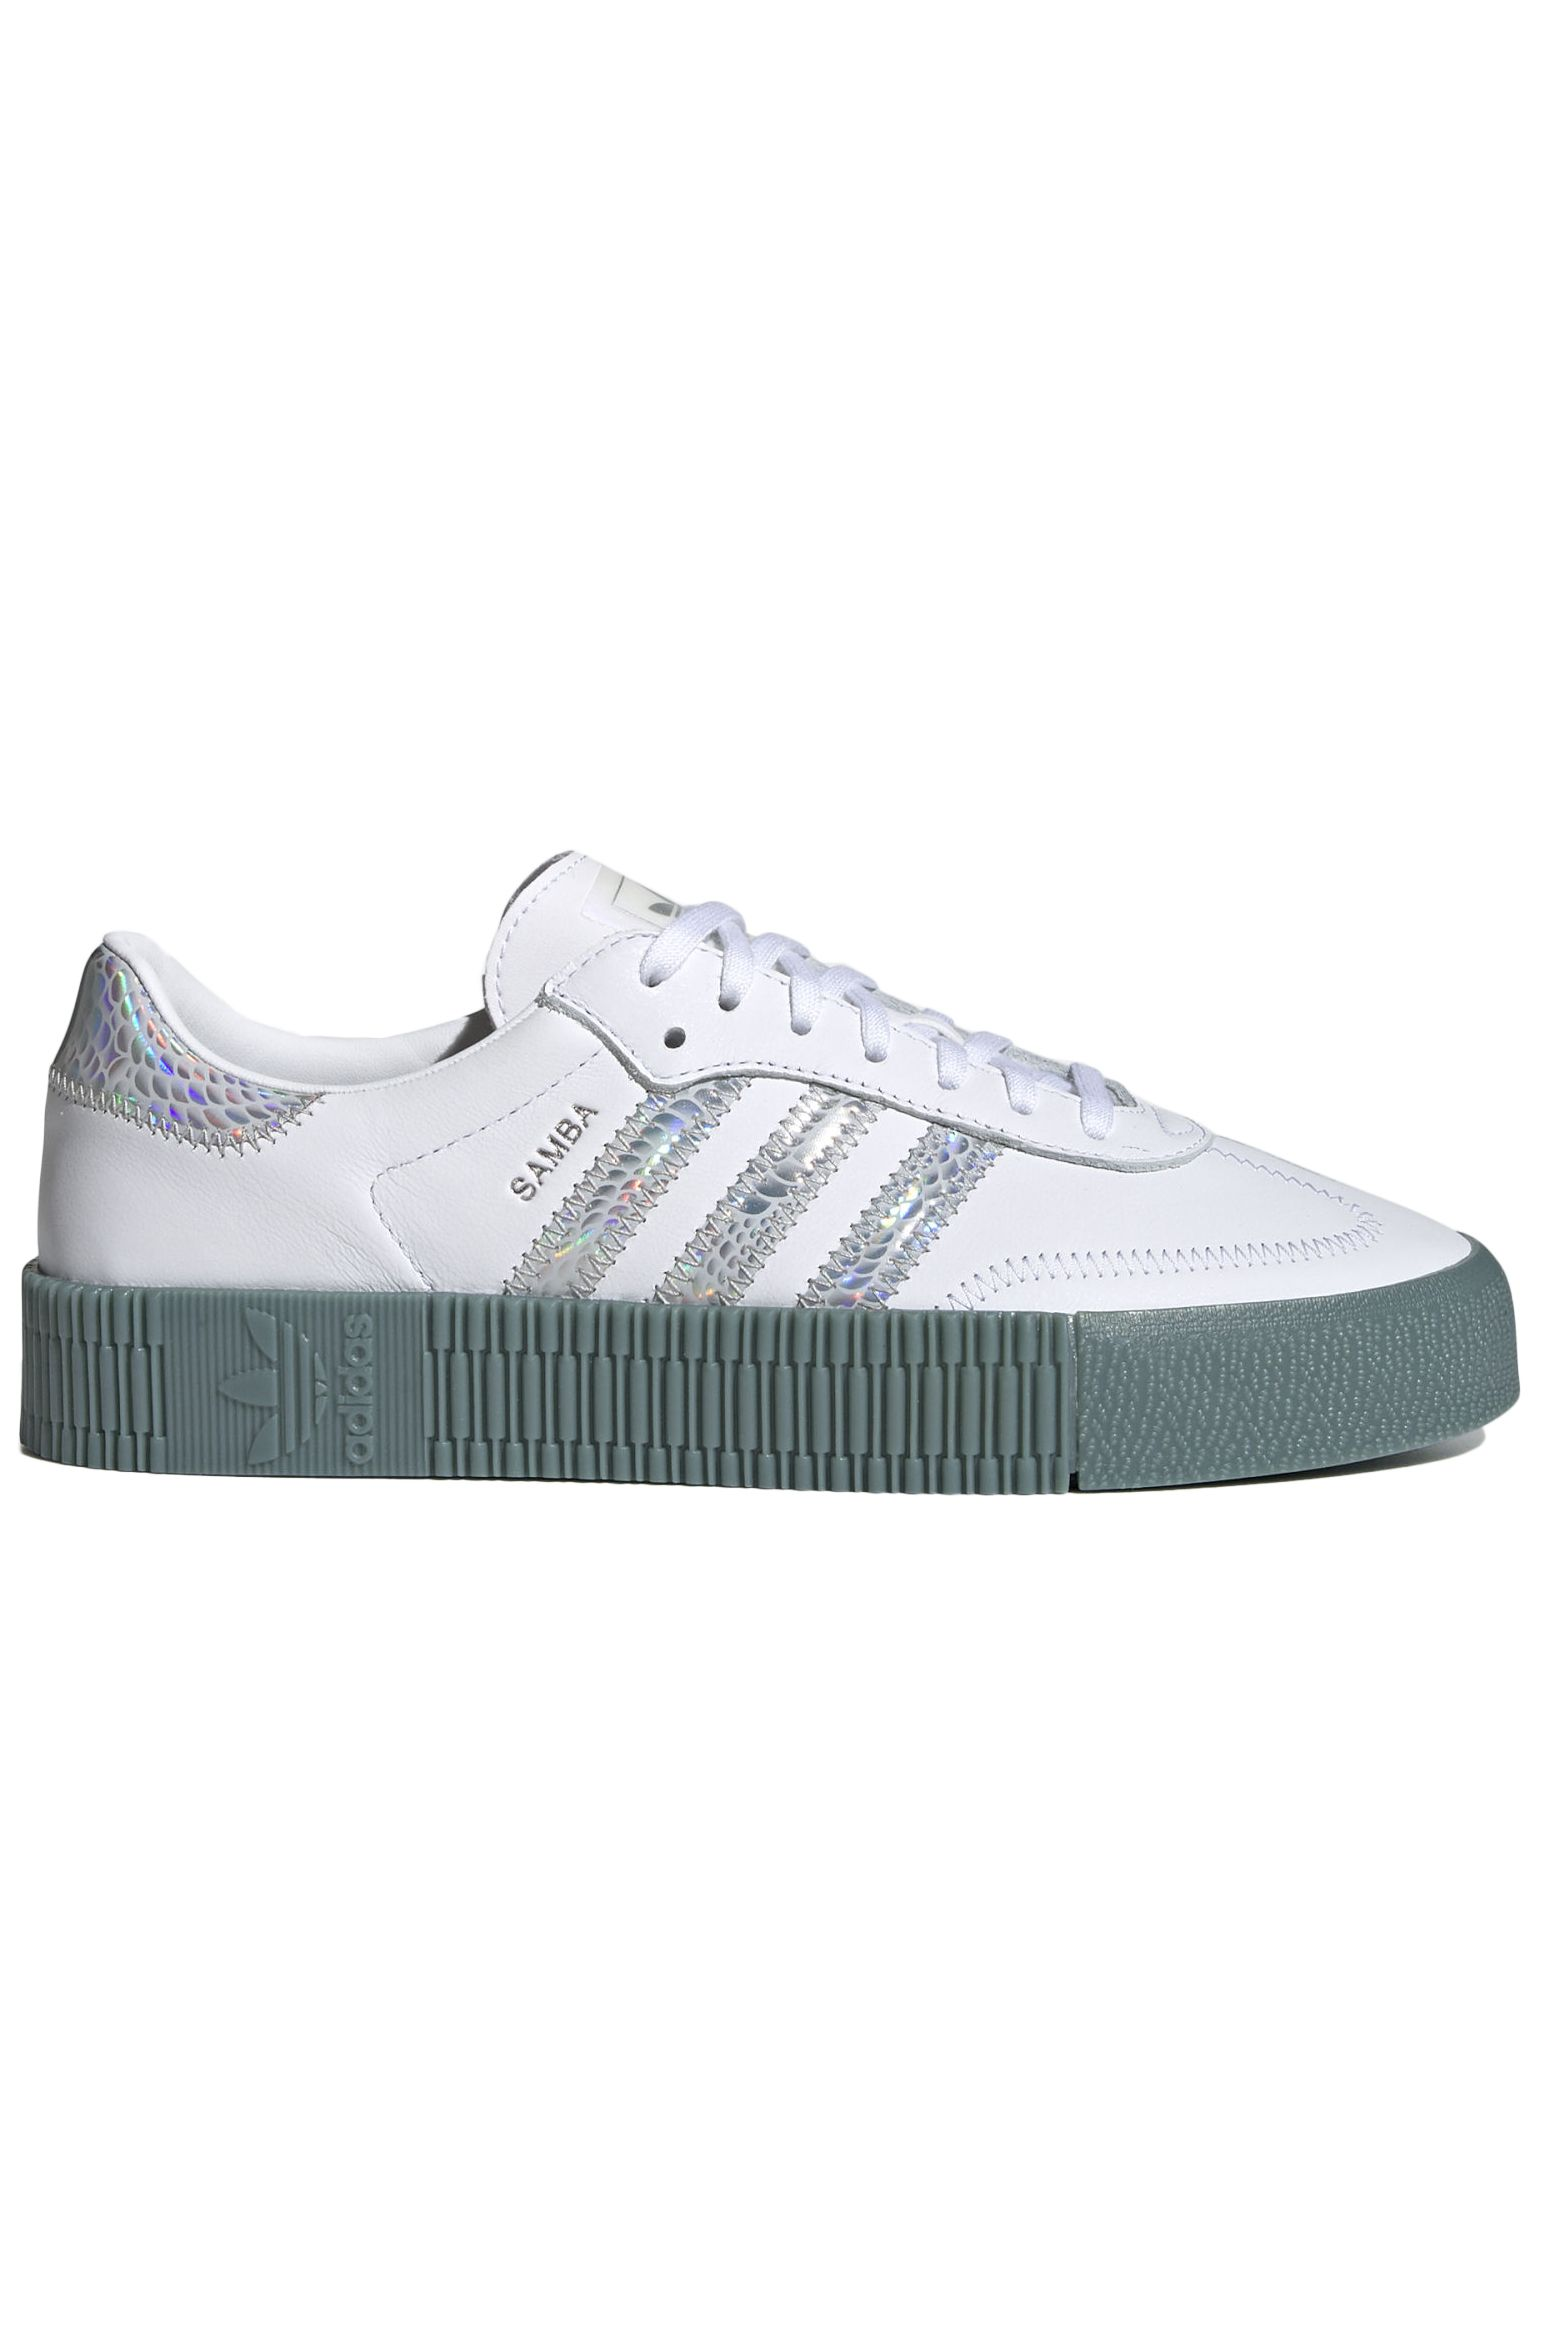 Tenis Adidas SAMBAROSE W Ftwr White/Supplier Colour/Hazy Emerald